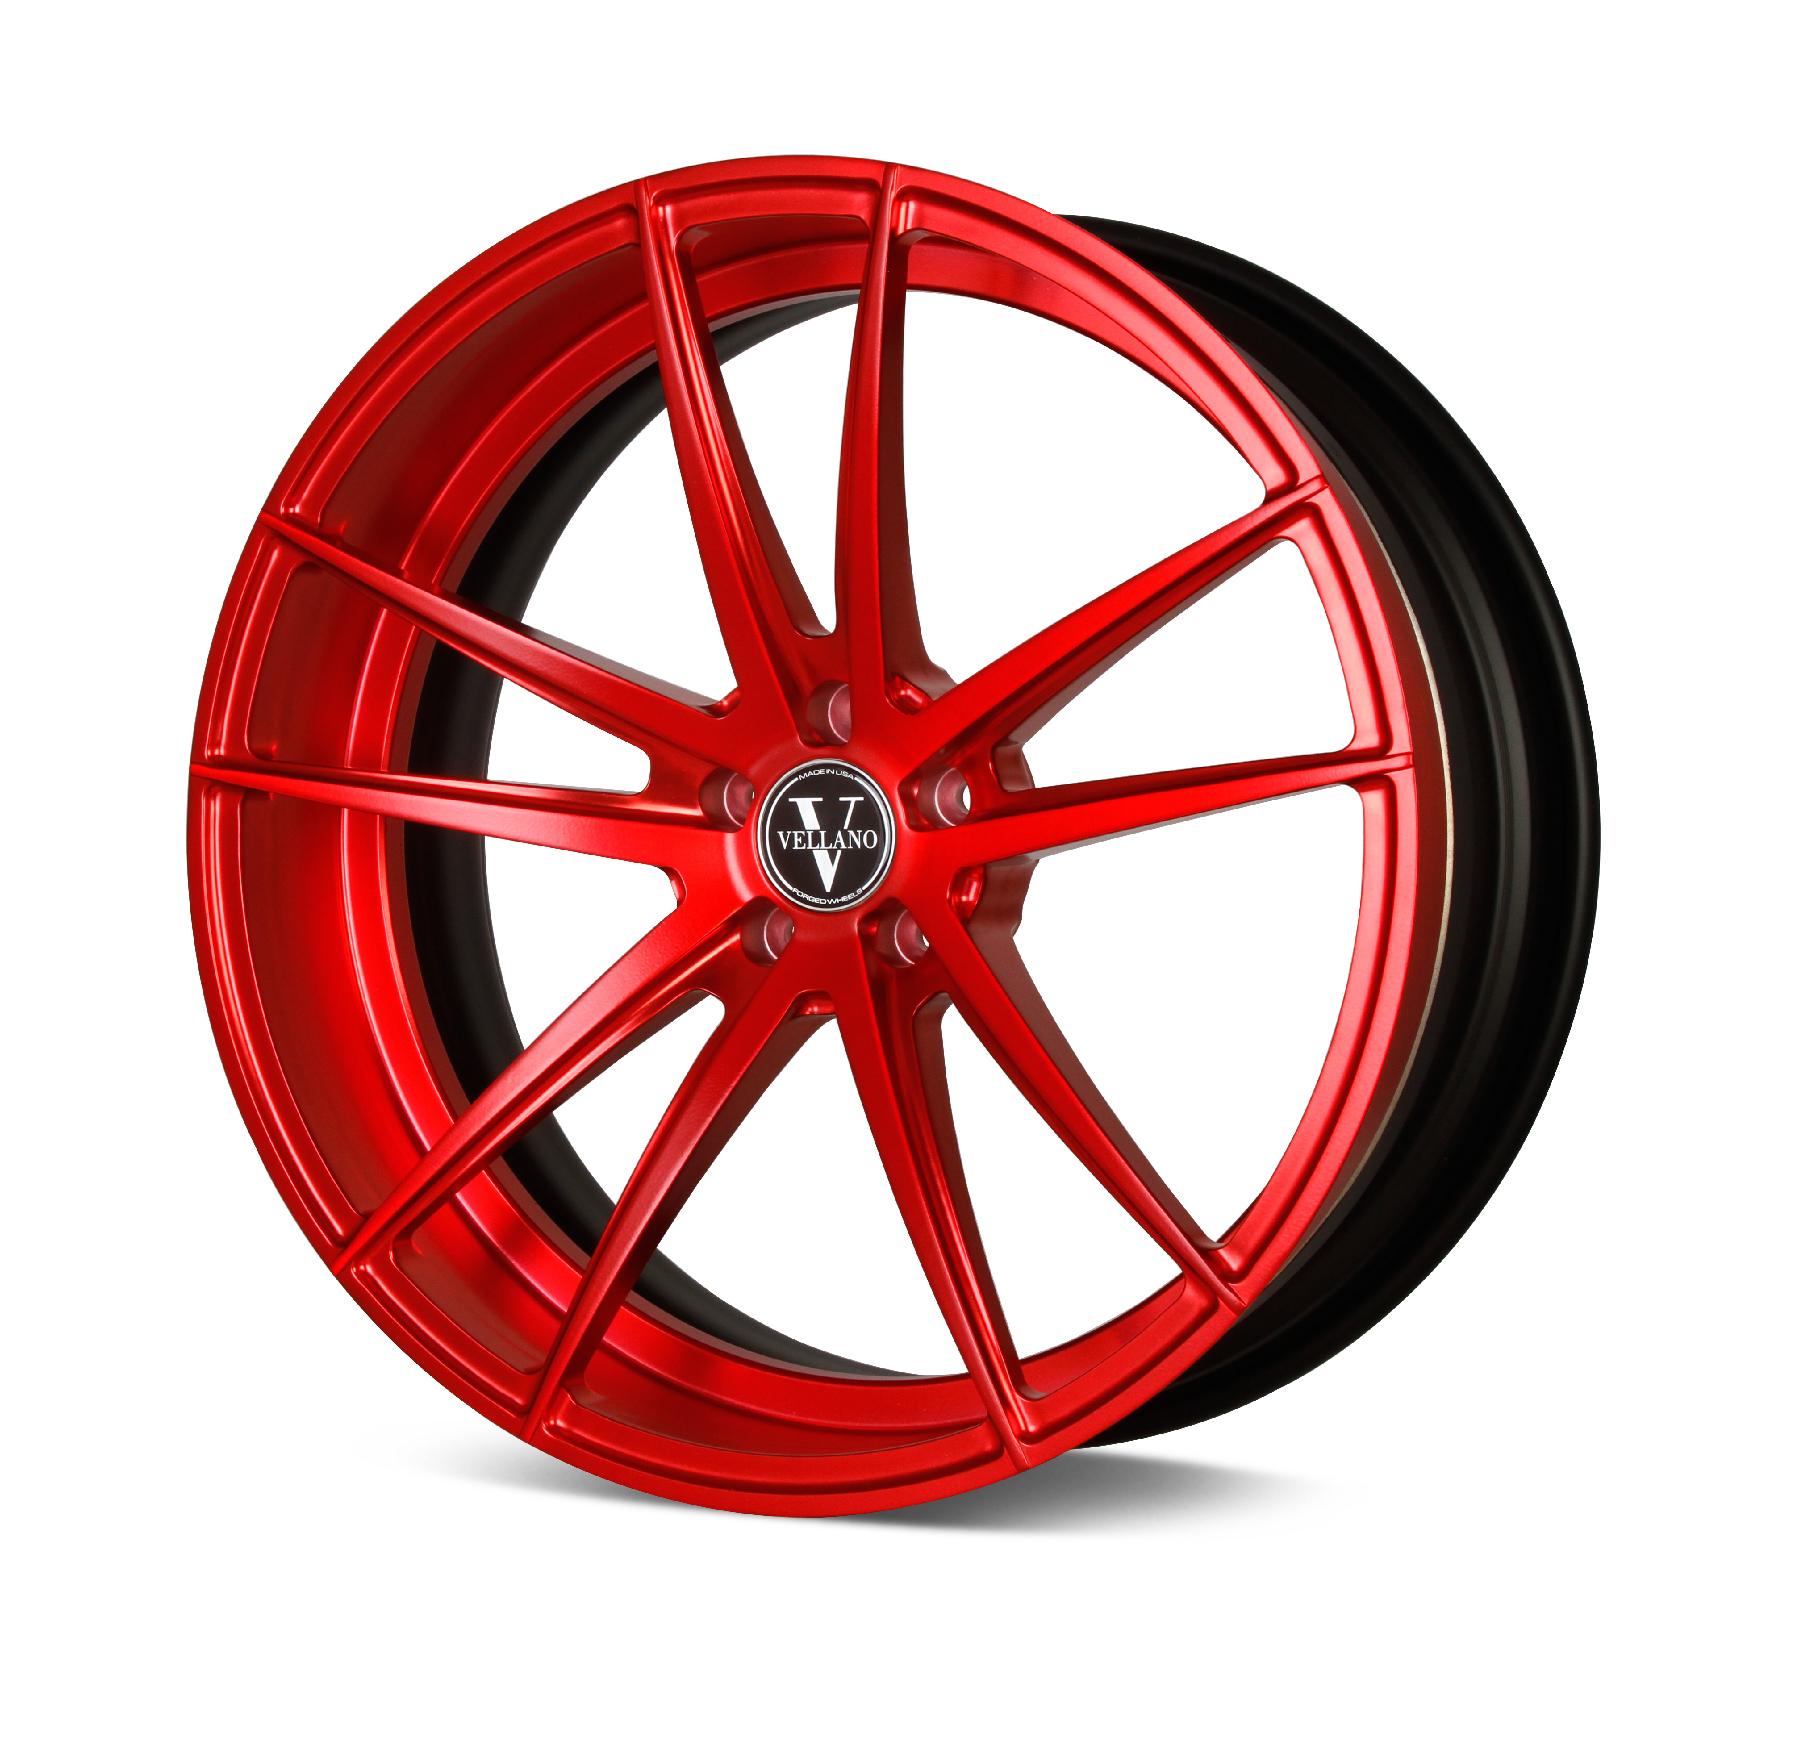 Vellano VM35 (2 Piece) forged wheels